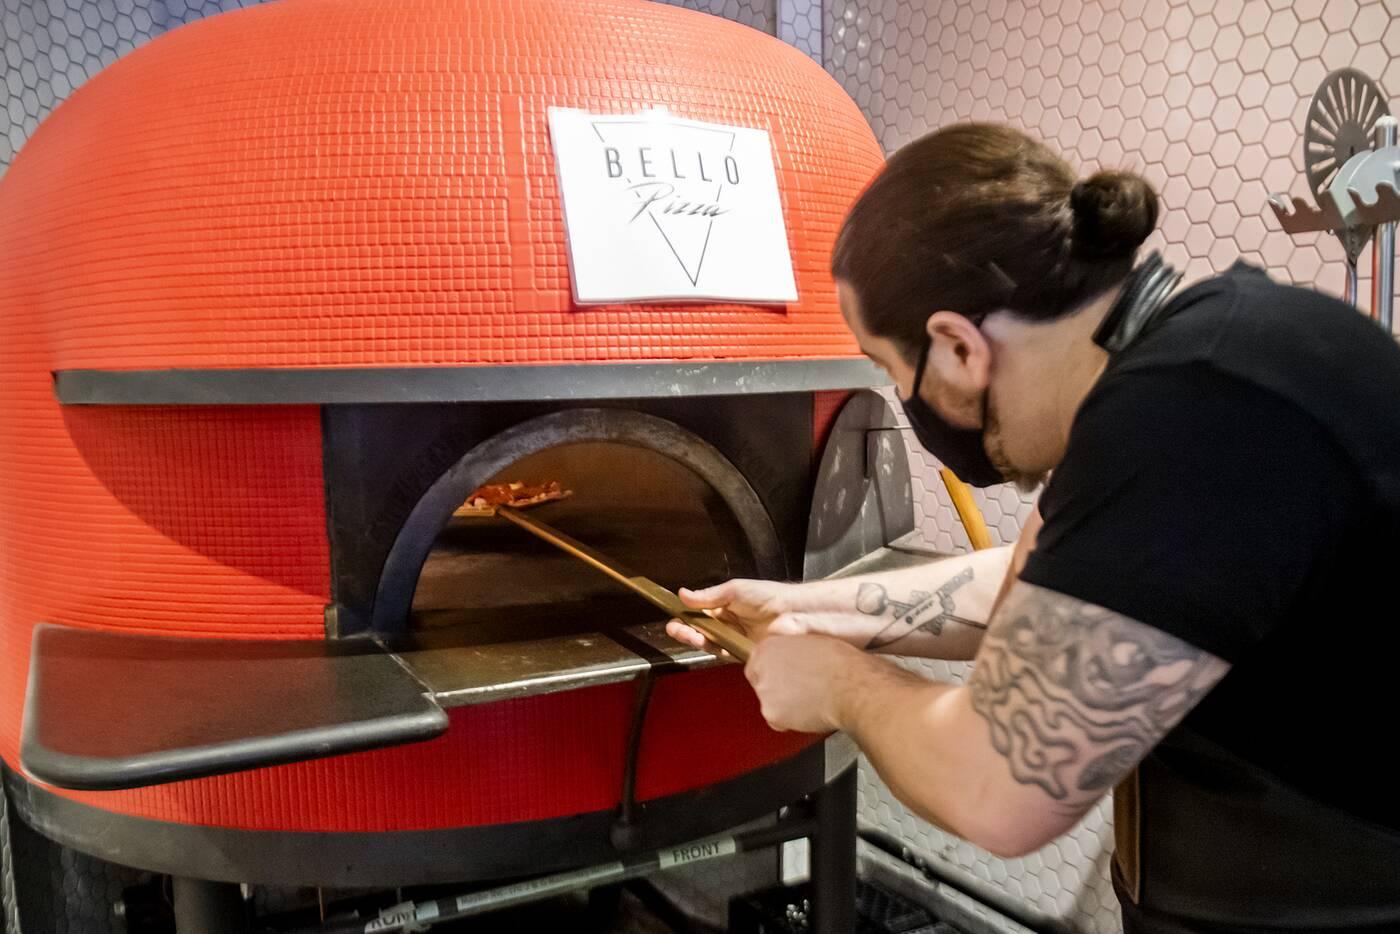 bello pizza toronto